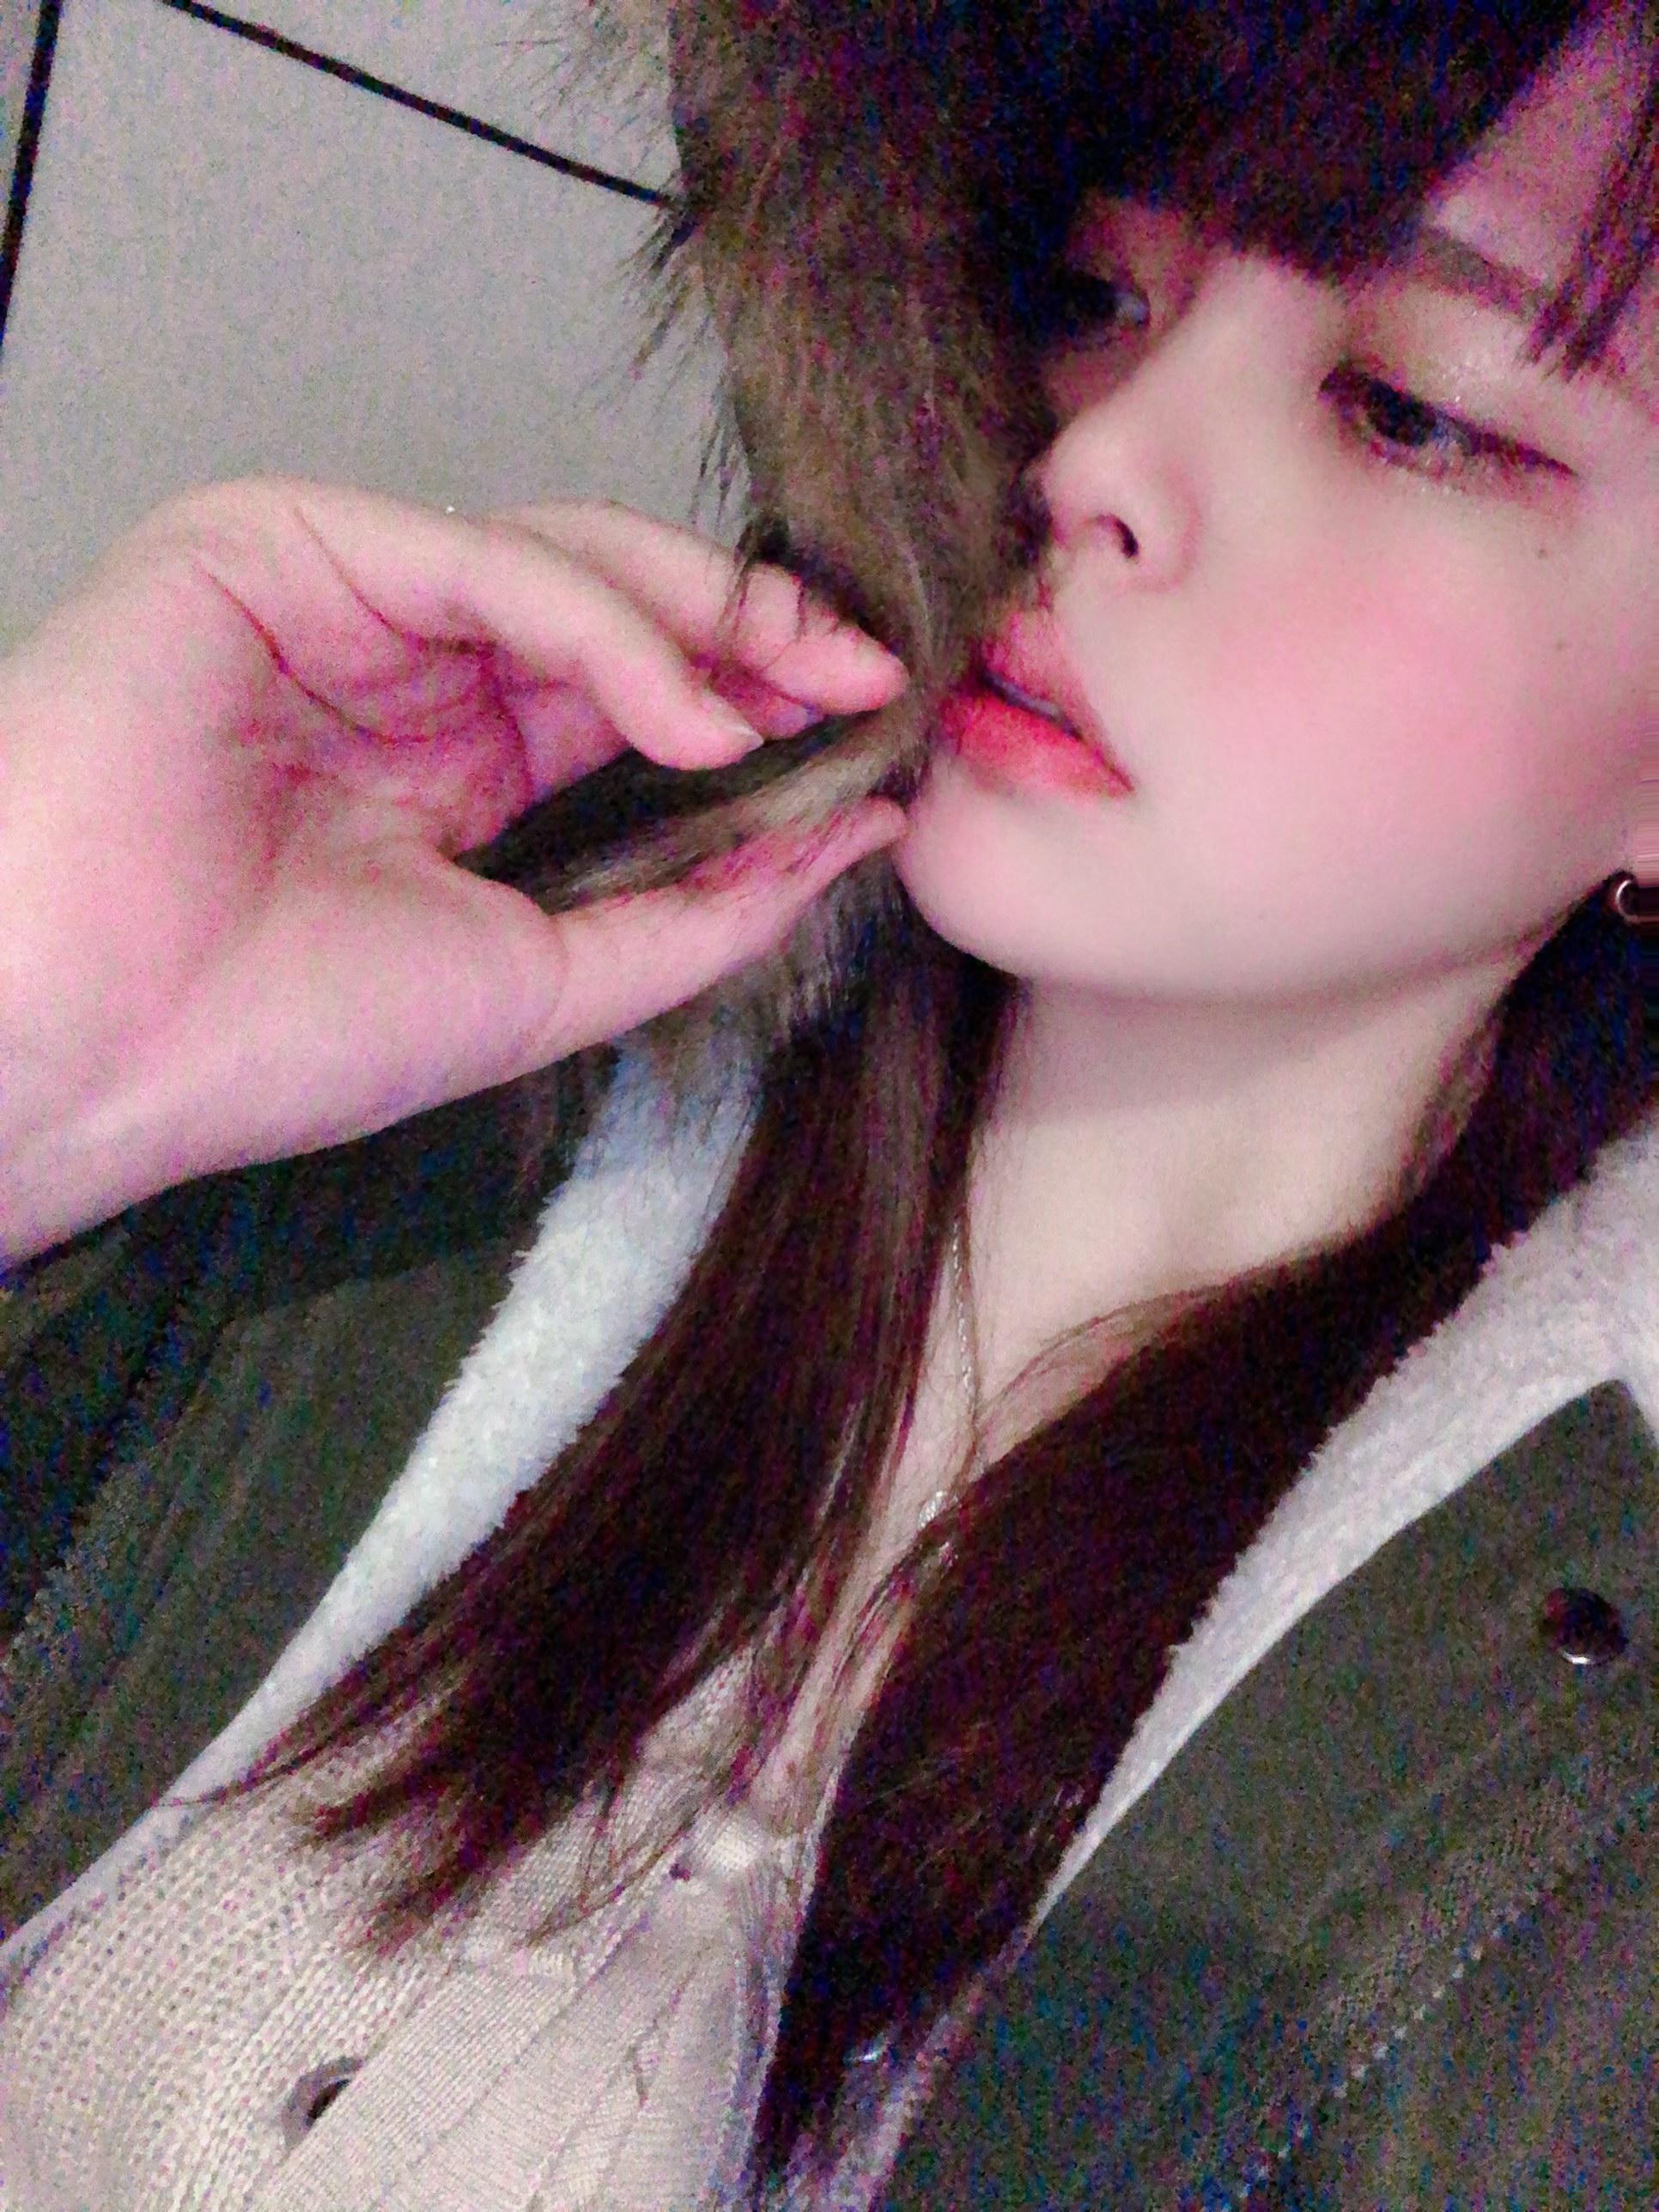 「Re: ( 」´□`)」コンバンワ~」02/21(02/21) 19:32 | りあんの写メ・風俗動画